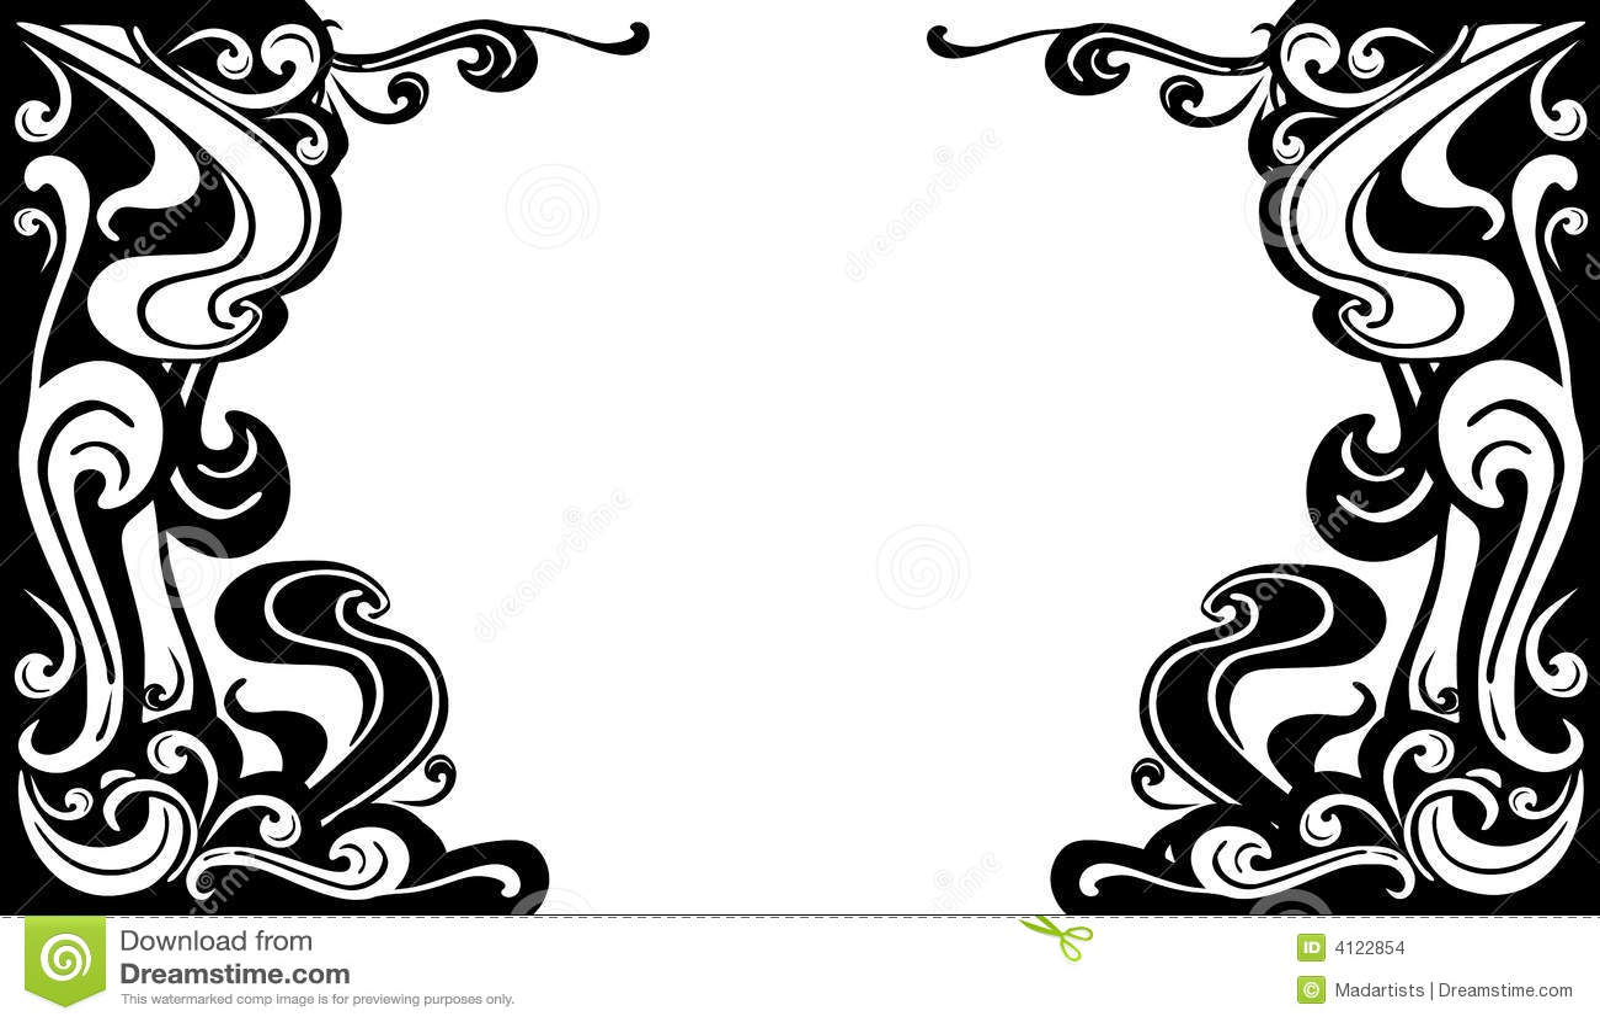 Decorative Black White Flourishes Borders Stock Illustration